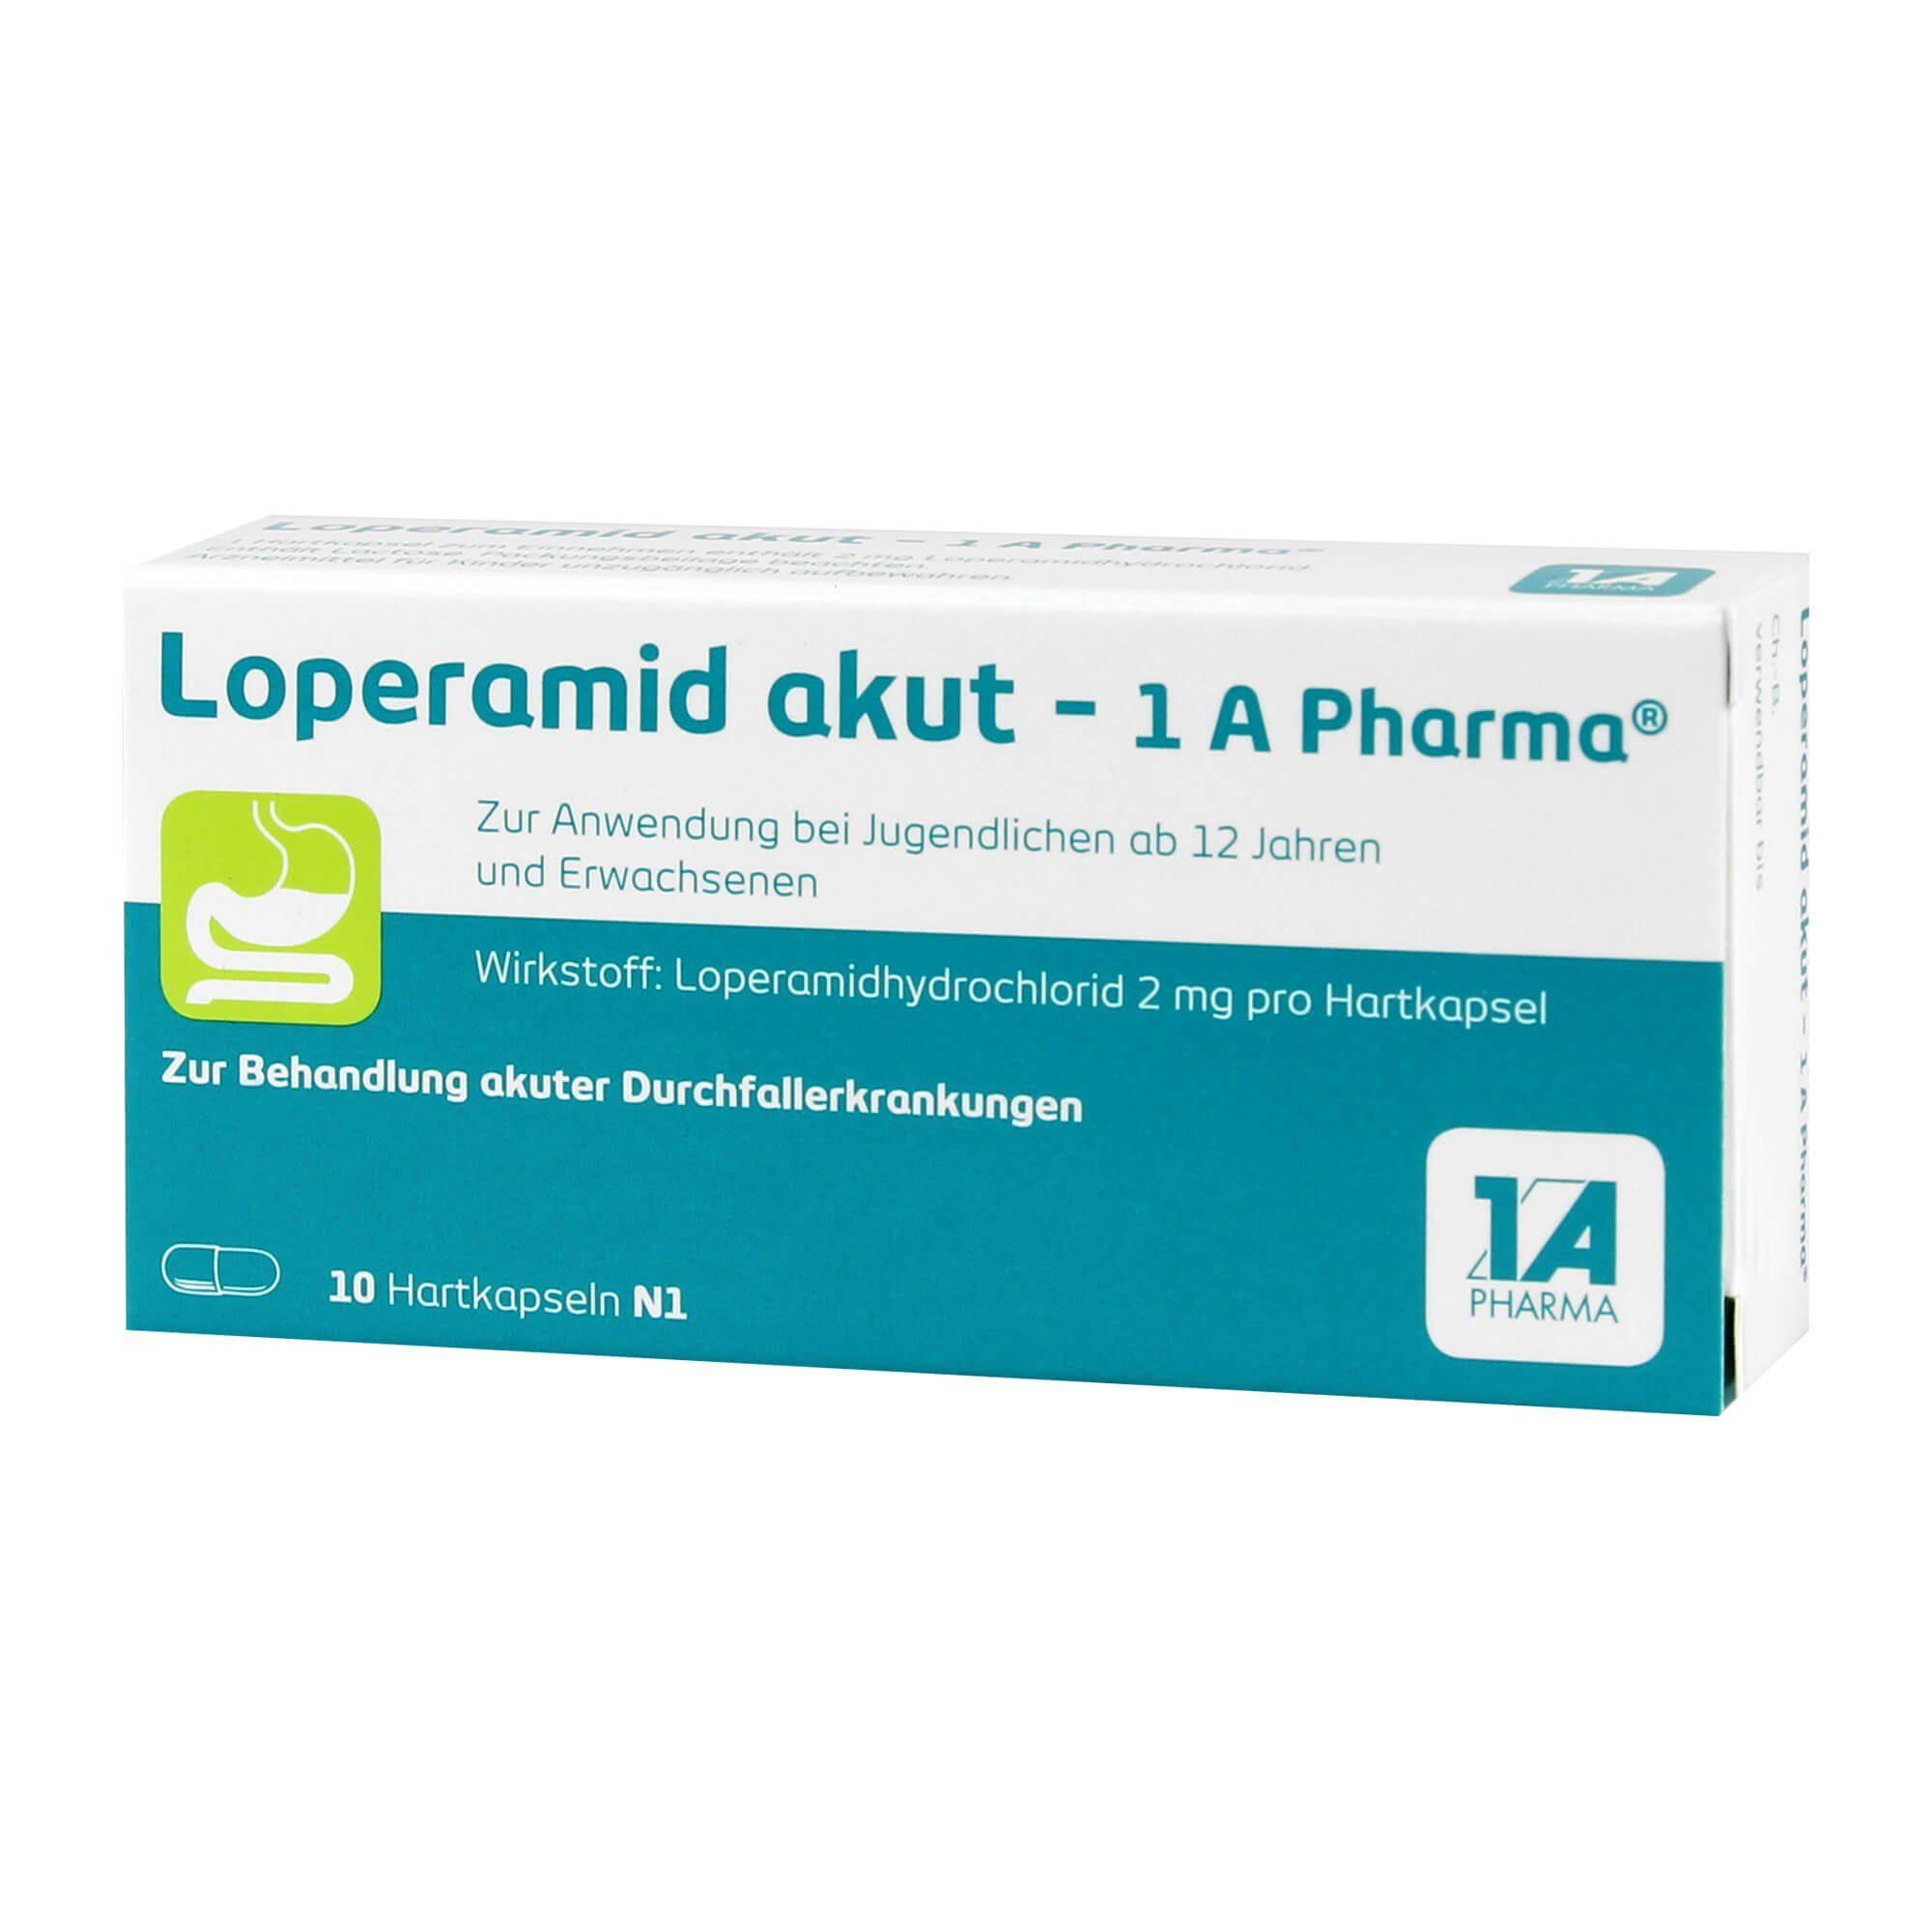 Loperamid akut 1A Pharma, 10 St